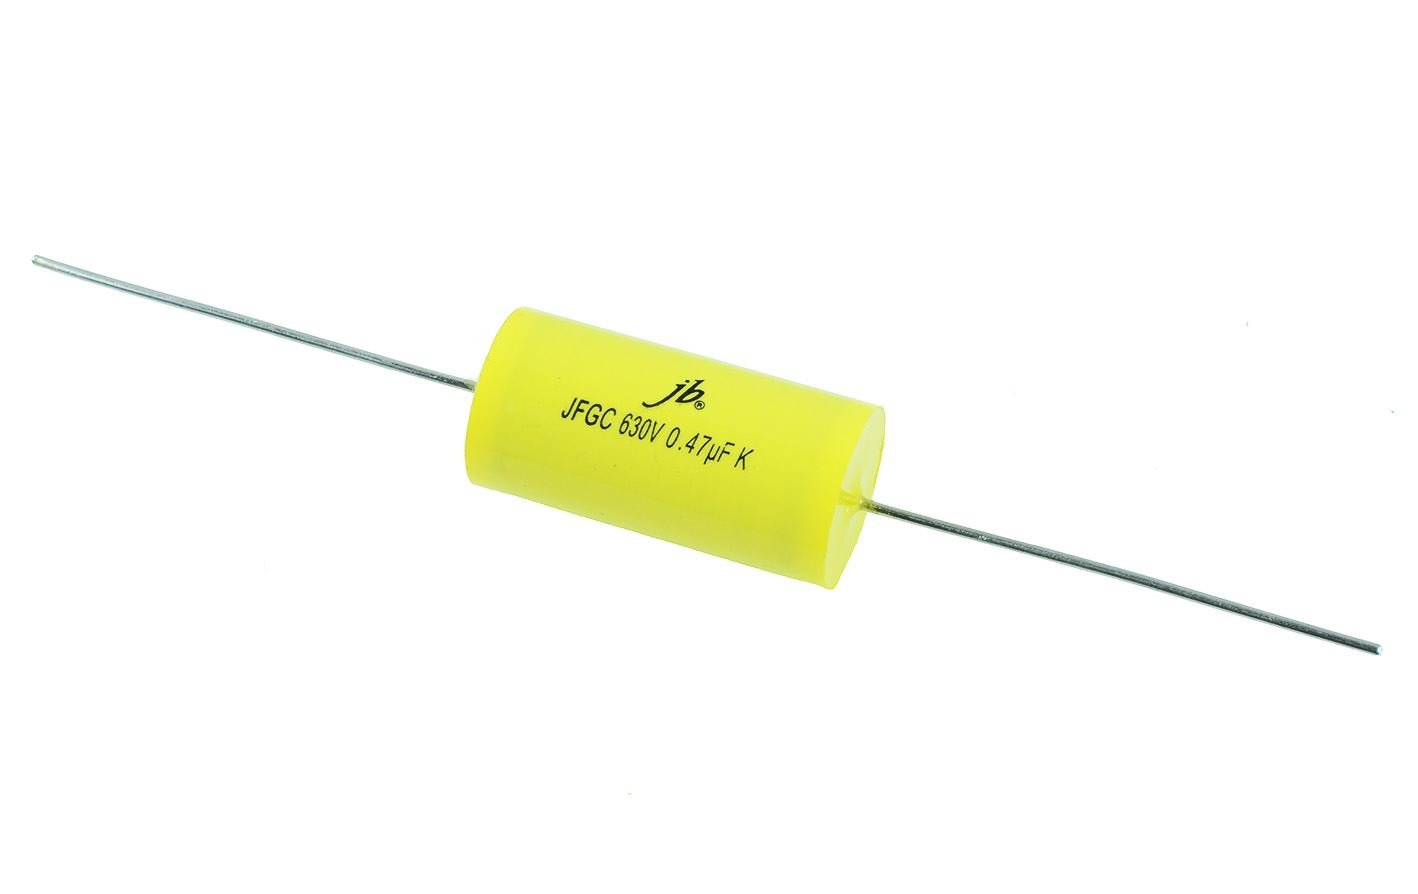 25 St/ück 25 x 1nF axiale metallisierte Polypropylen-Folien-Kondensator 630 V /± 10/%